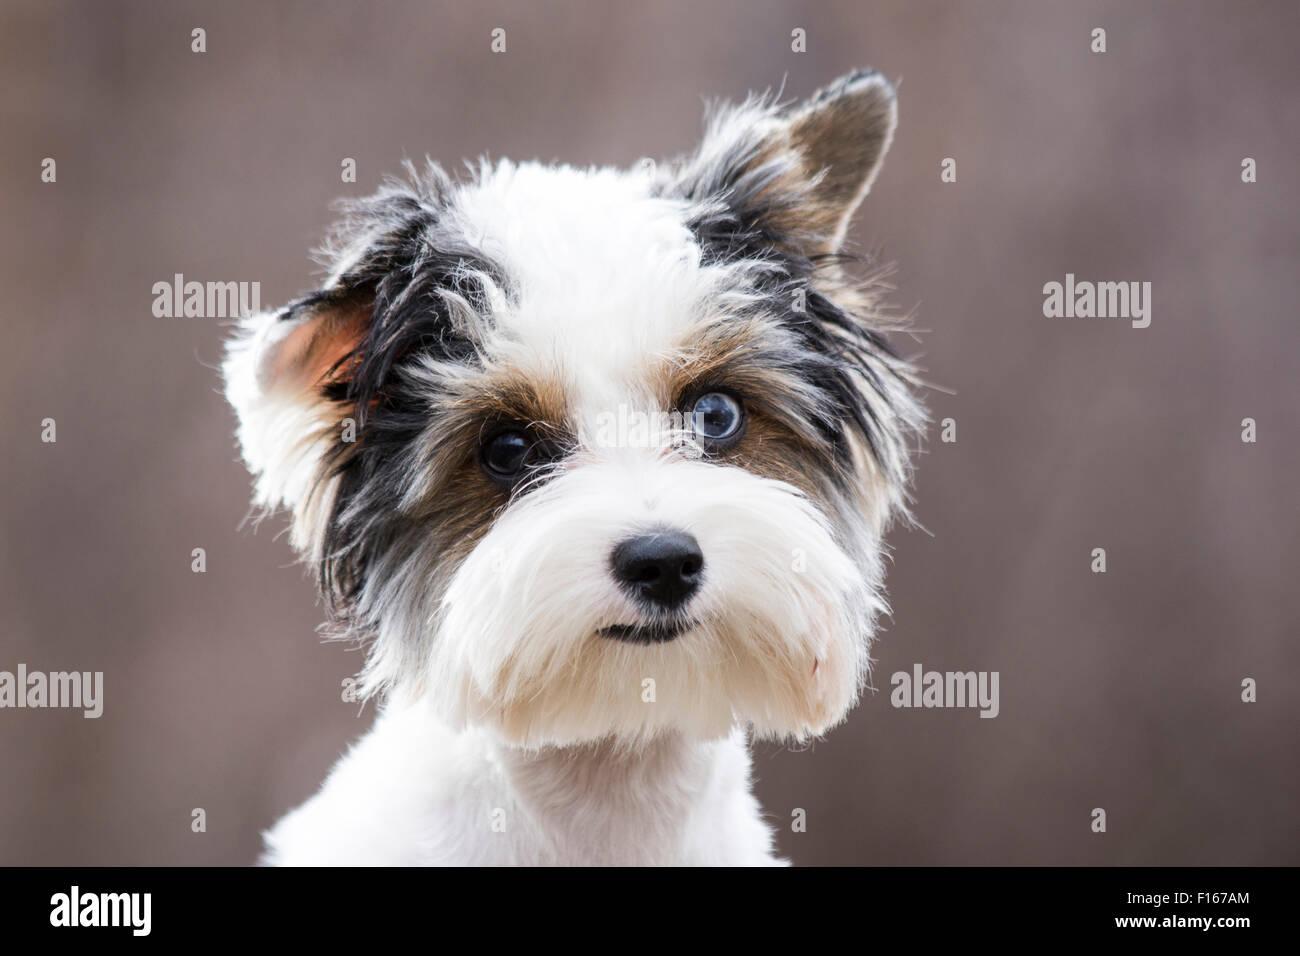 Poco alegre cachorro tricolor Imagen De Stock